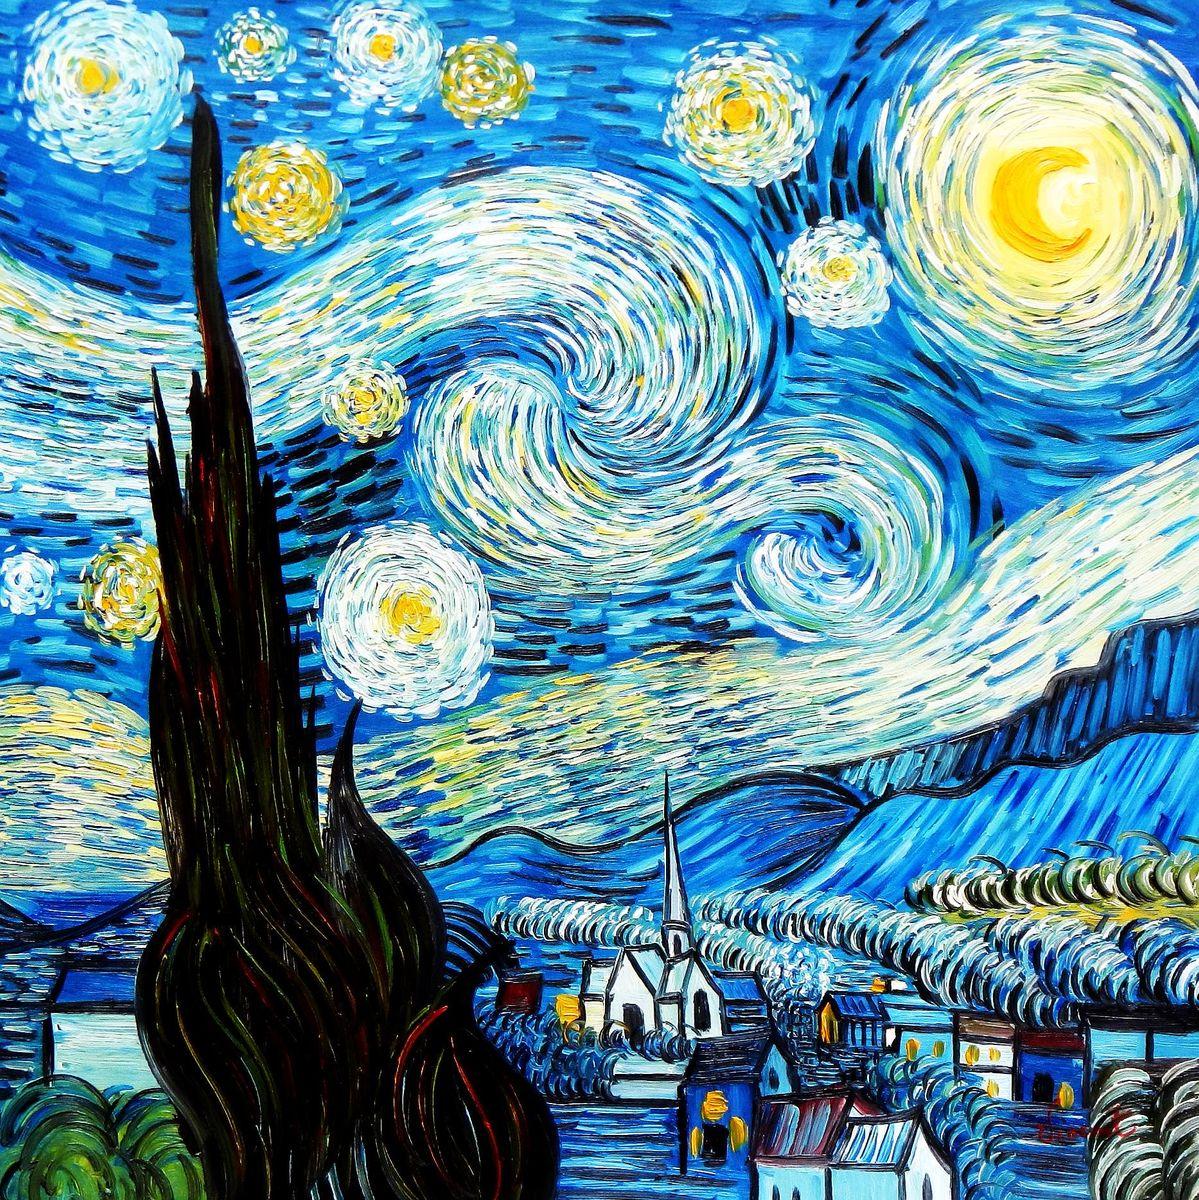 Vincent van Gogh - Sternennacht g92951 80x80cm exzellentes Ölgemälde handgemalt